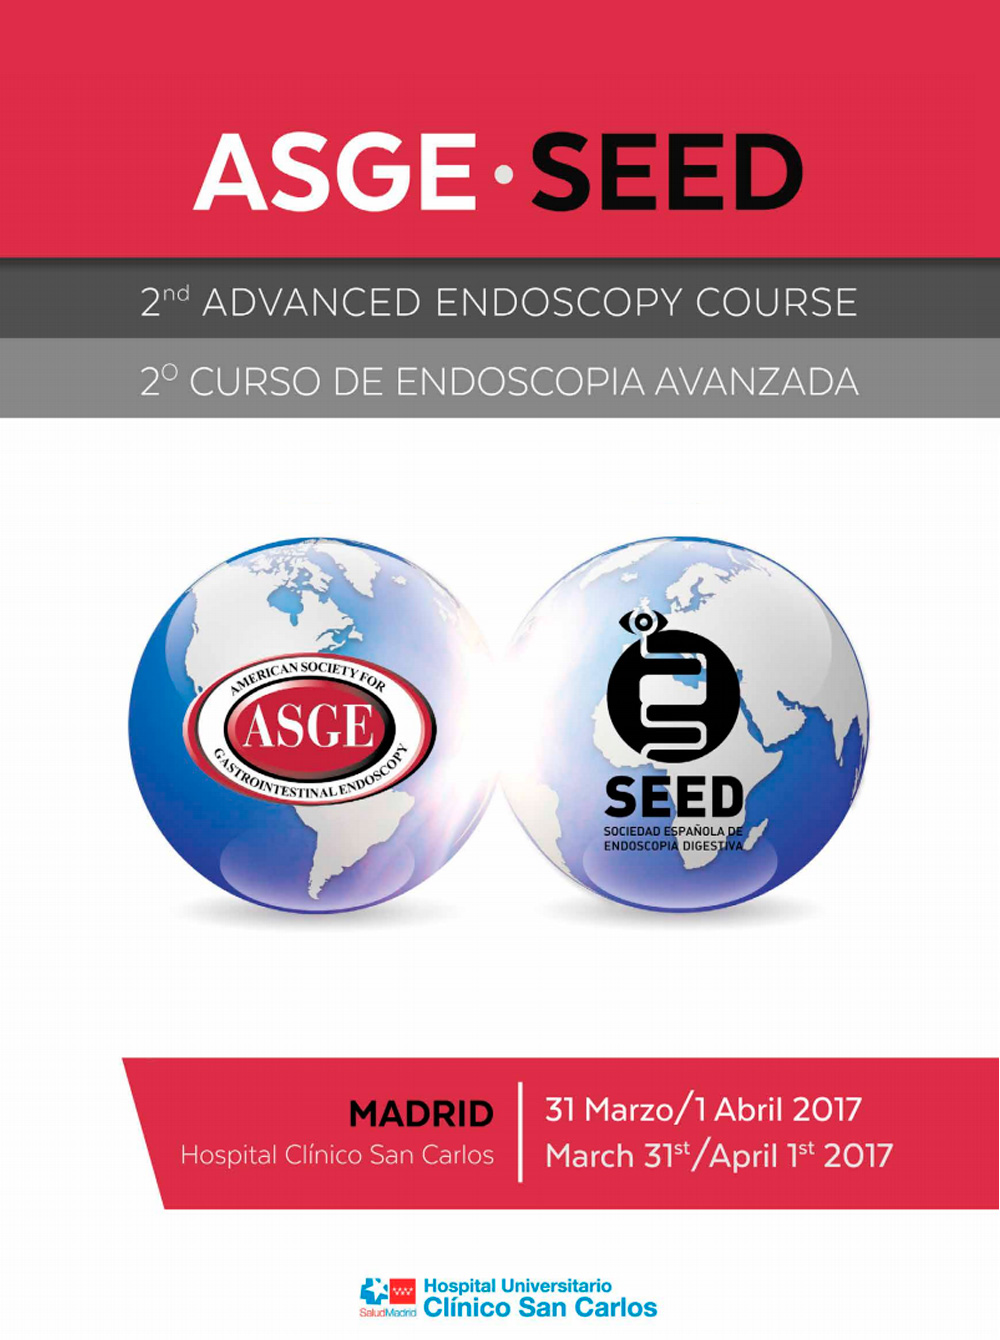 asge-seed.jpg